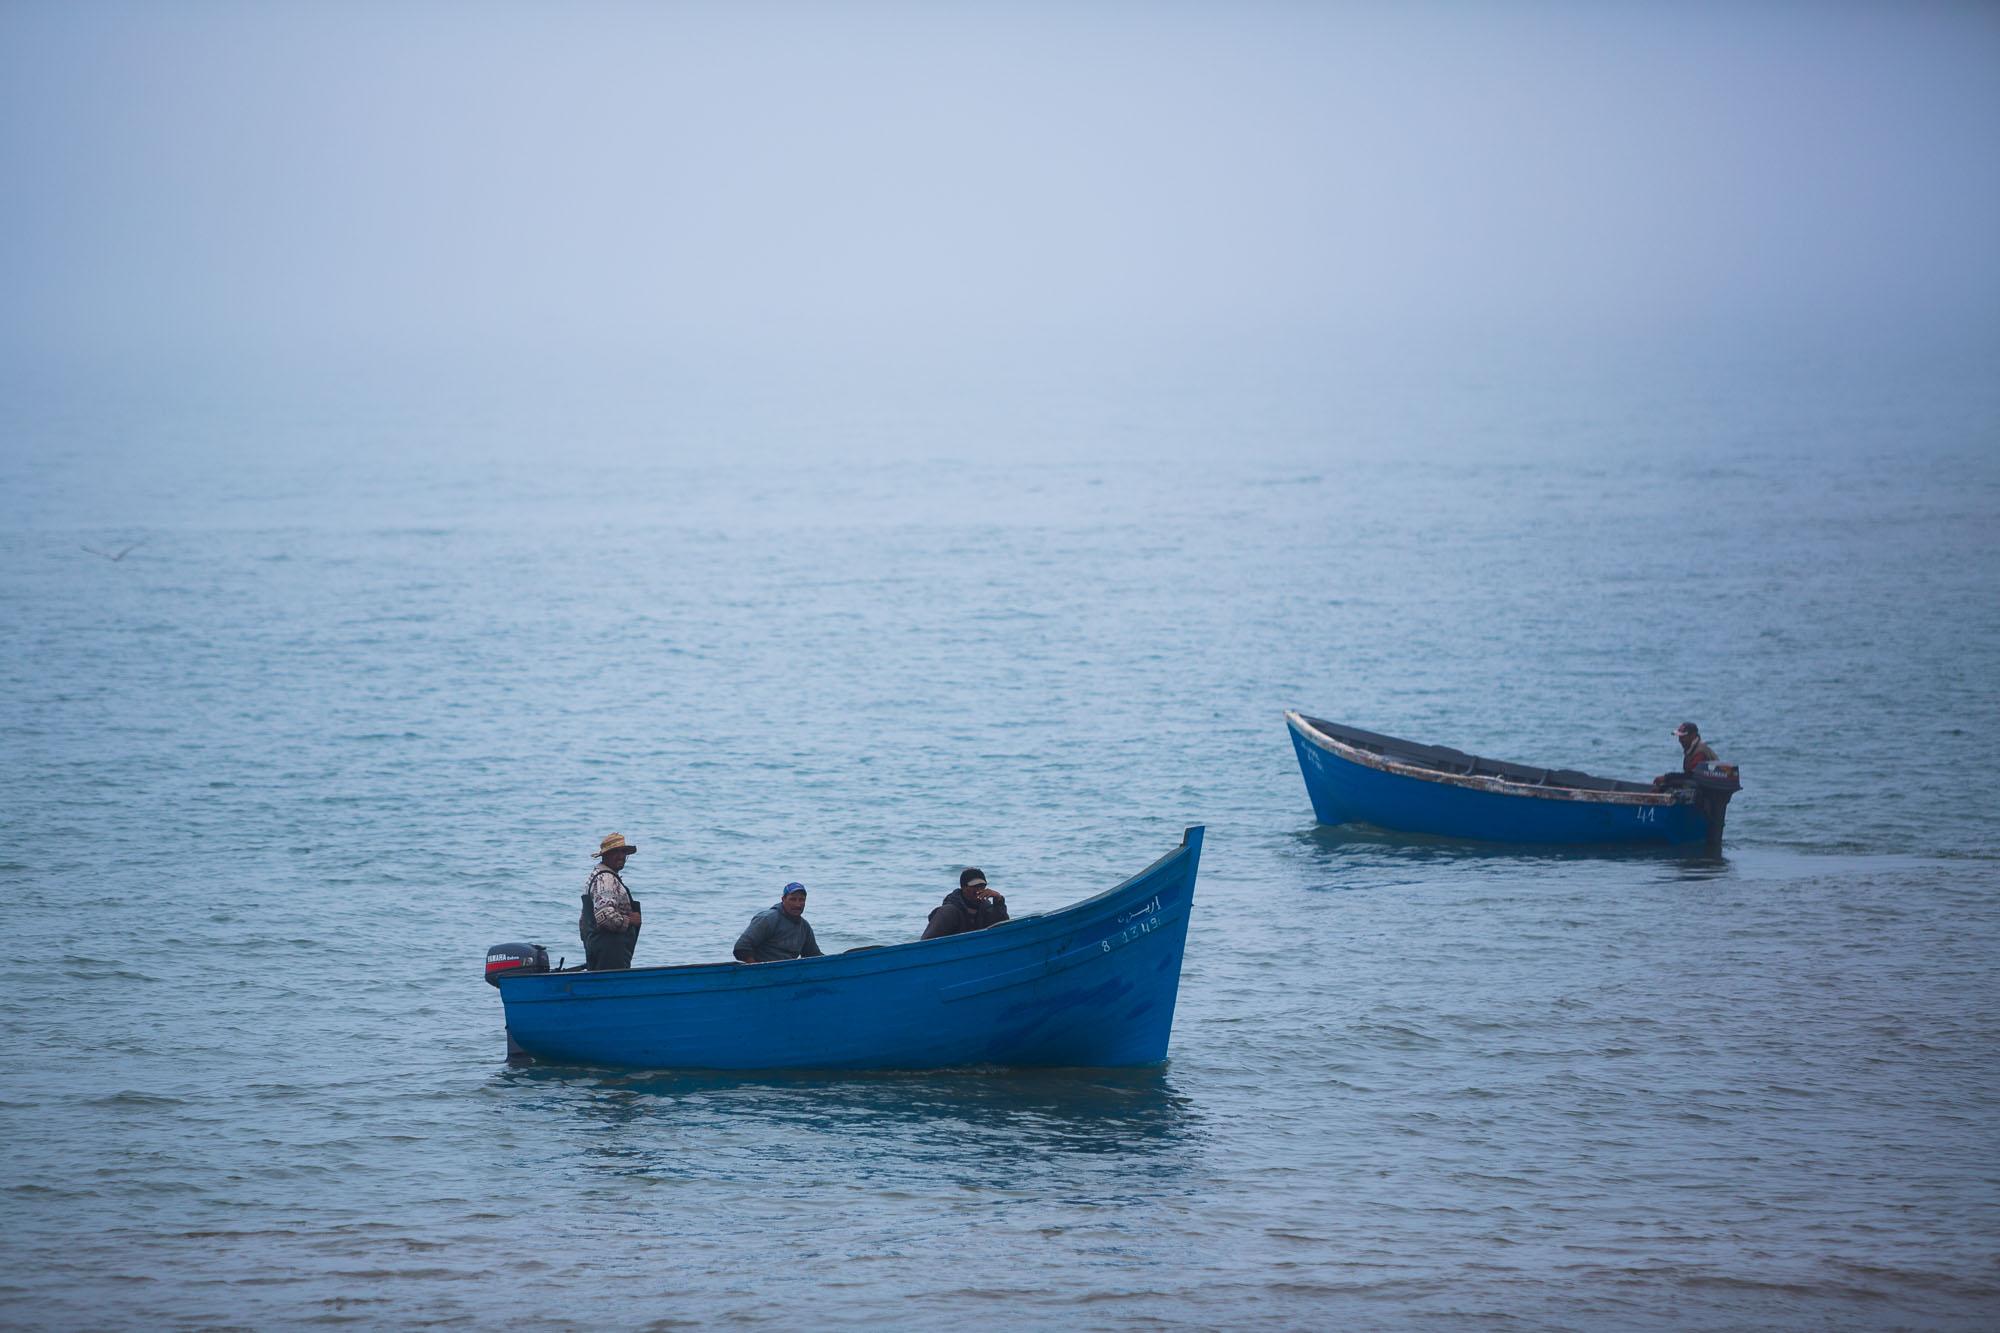 Fisherman at sea off the coast of Agadir, Morocco.